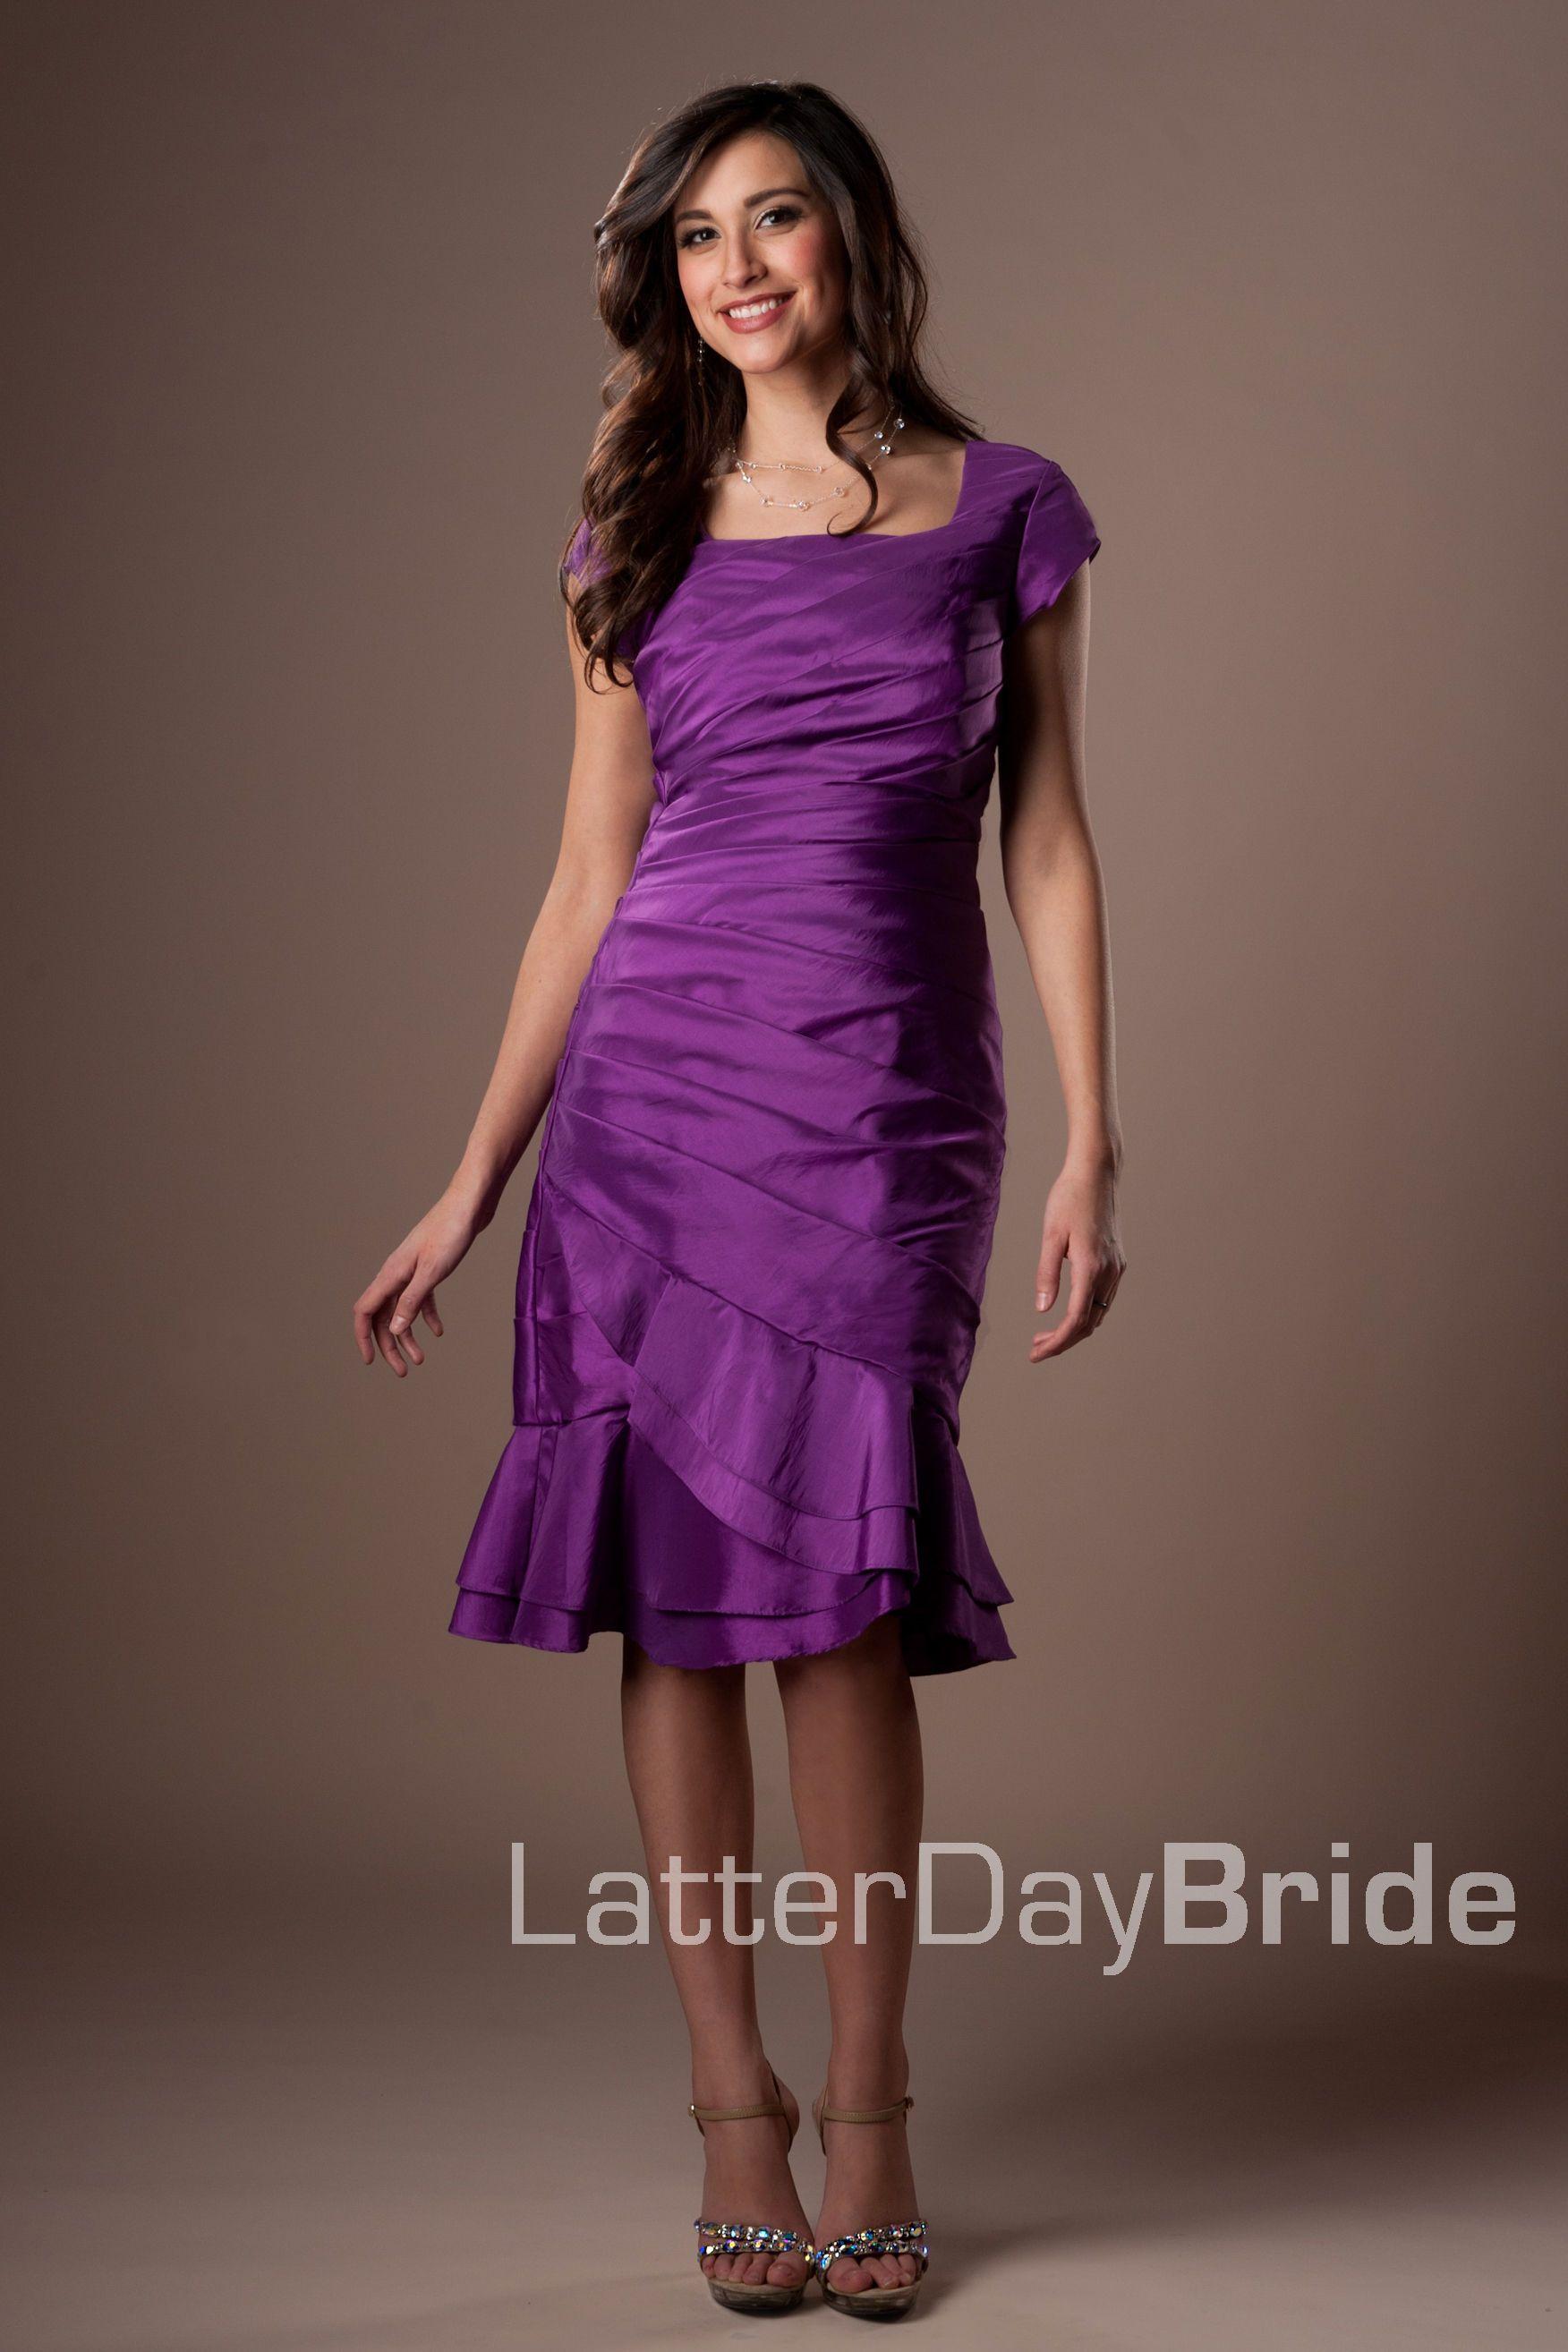 Bridesmaid & Prom, Deb | LatterDayBride & Prom Modest Mormon LDS ...